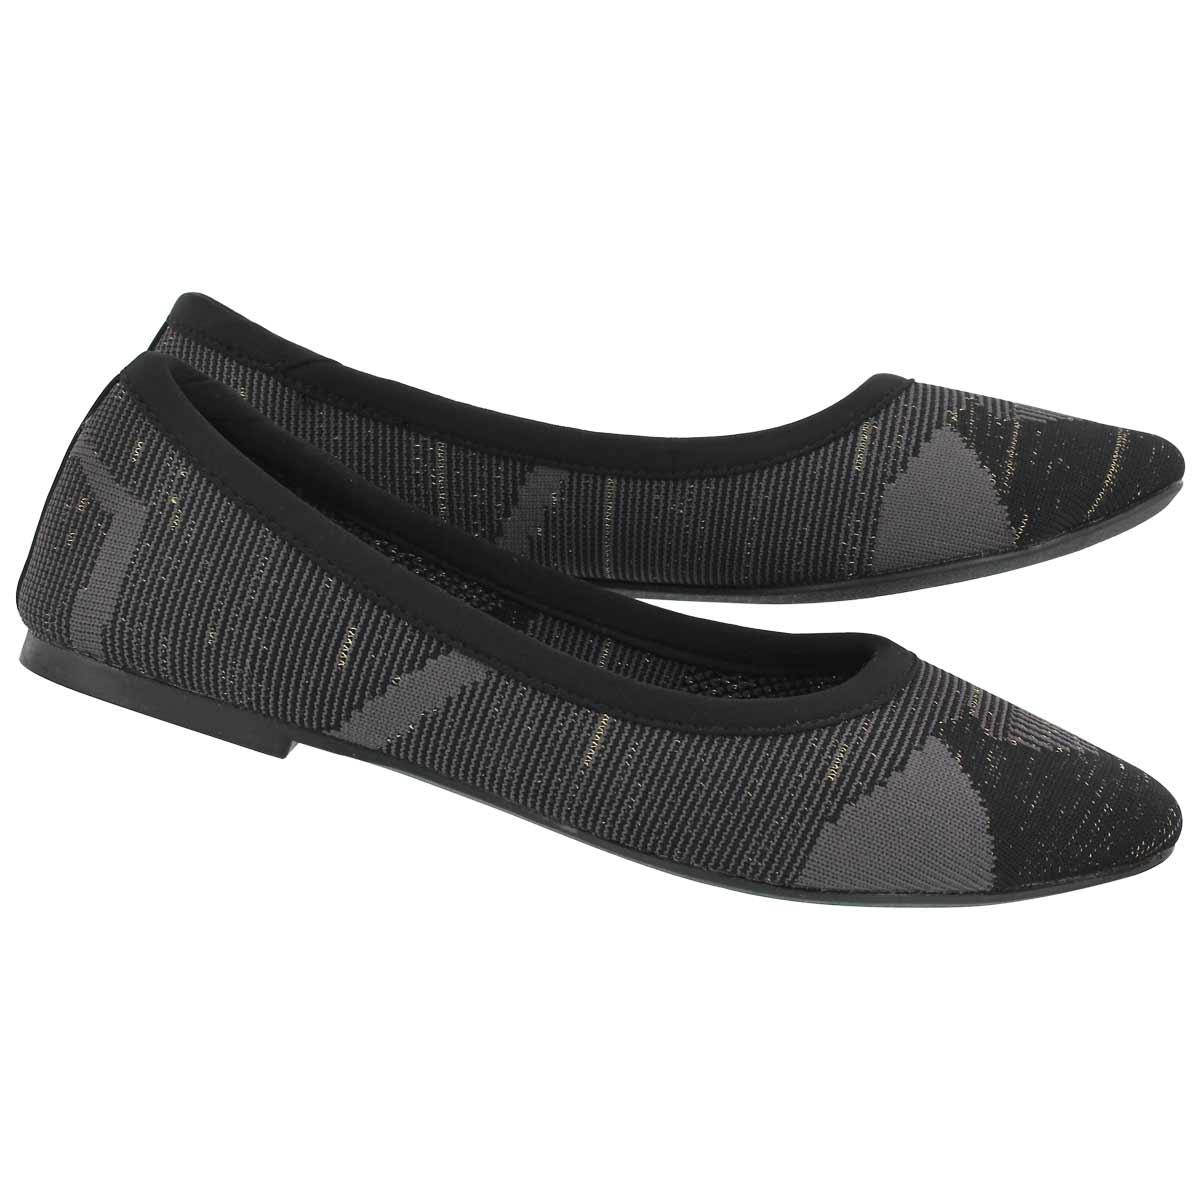 Lds Cleo Blitz black/grey casual flat